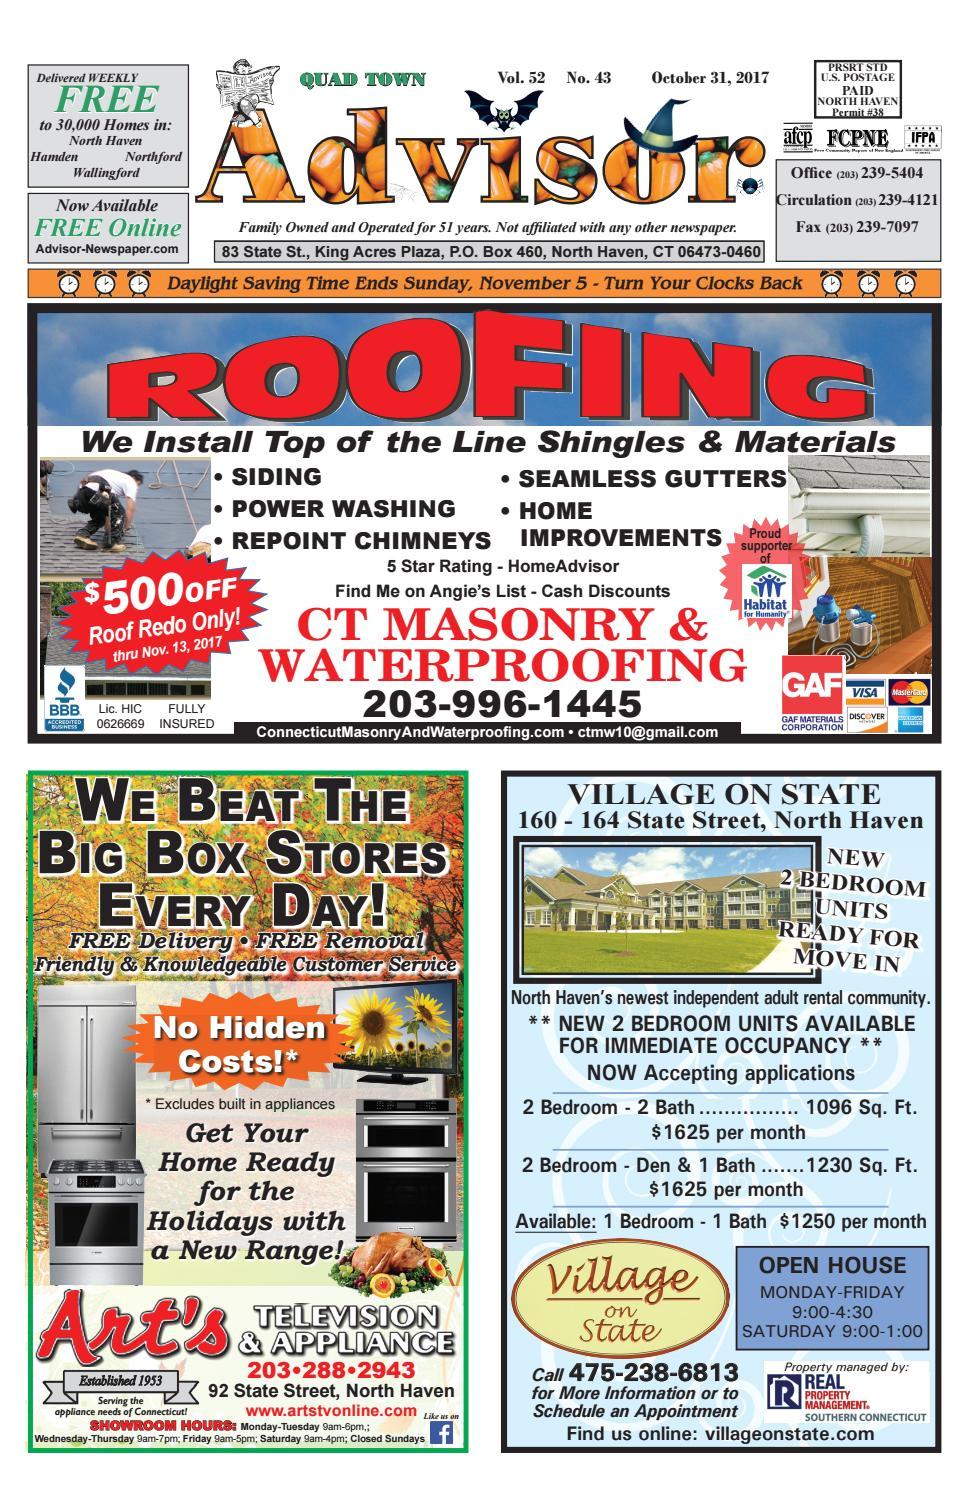 Gaf Virtual Home Remodeler the Advisor October 31 2017 by the Advisor Newspaper issuu